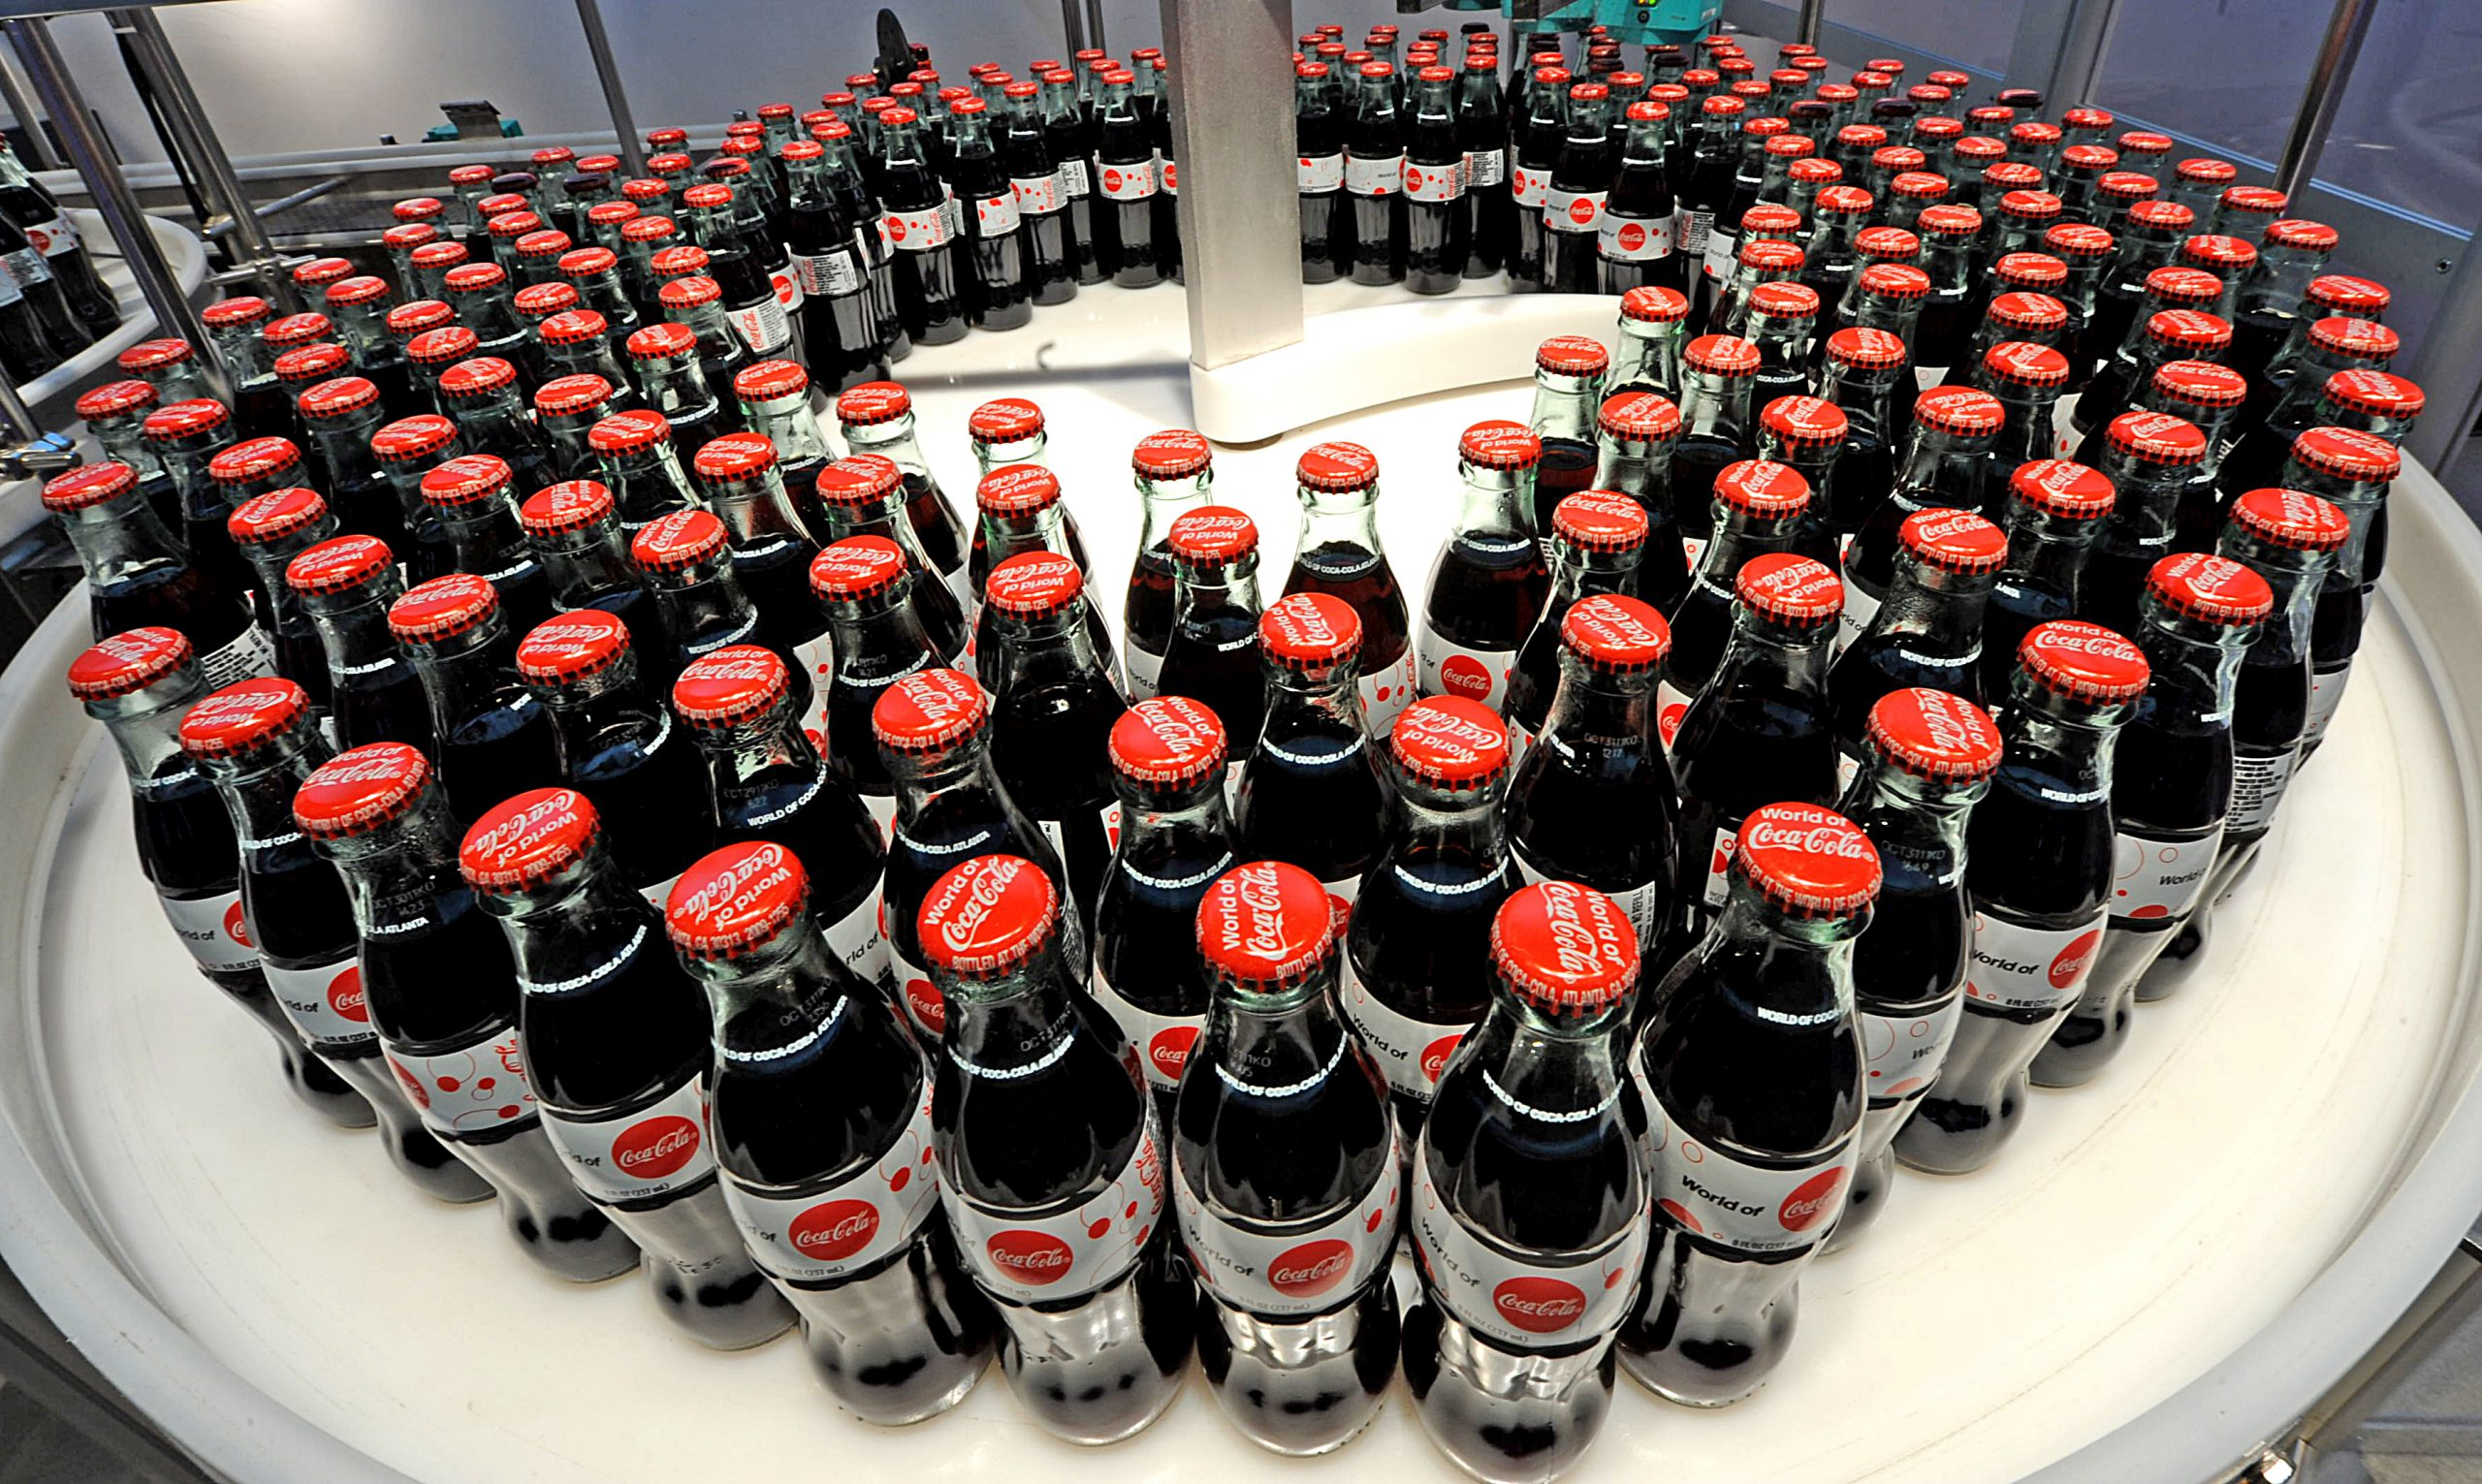 Atlanta-World-of-Coca-Cola-Bottles